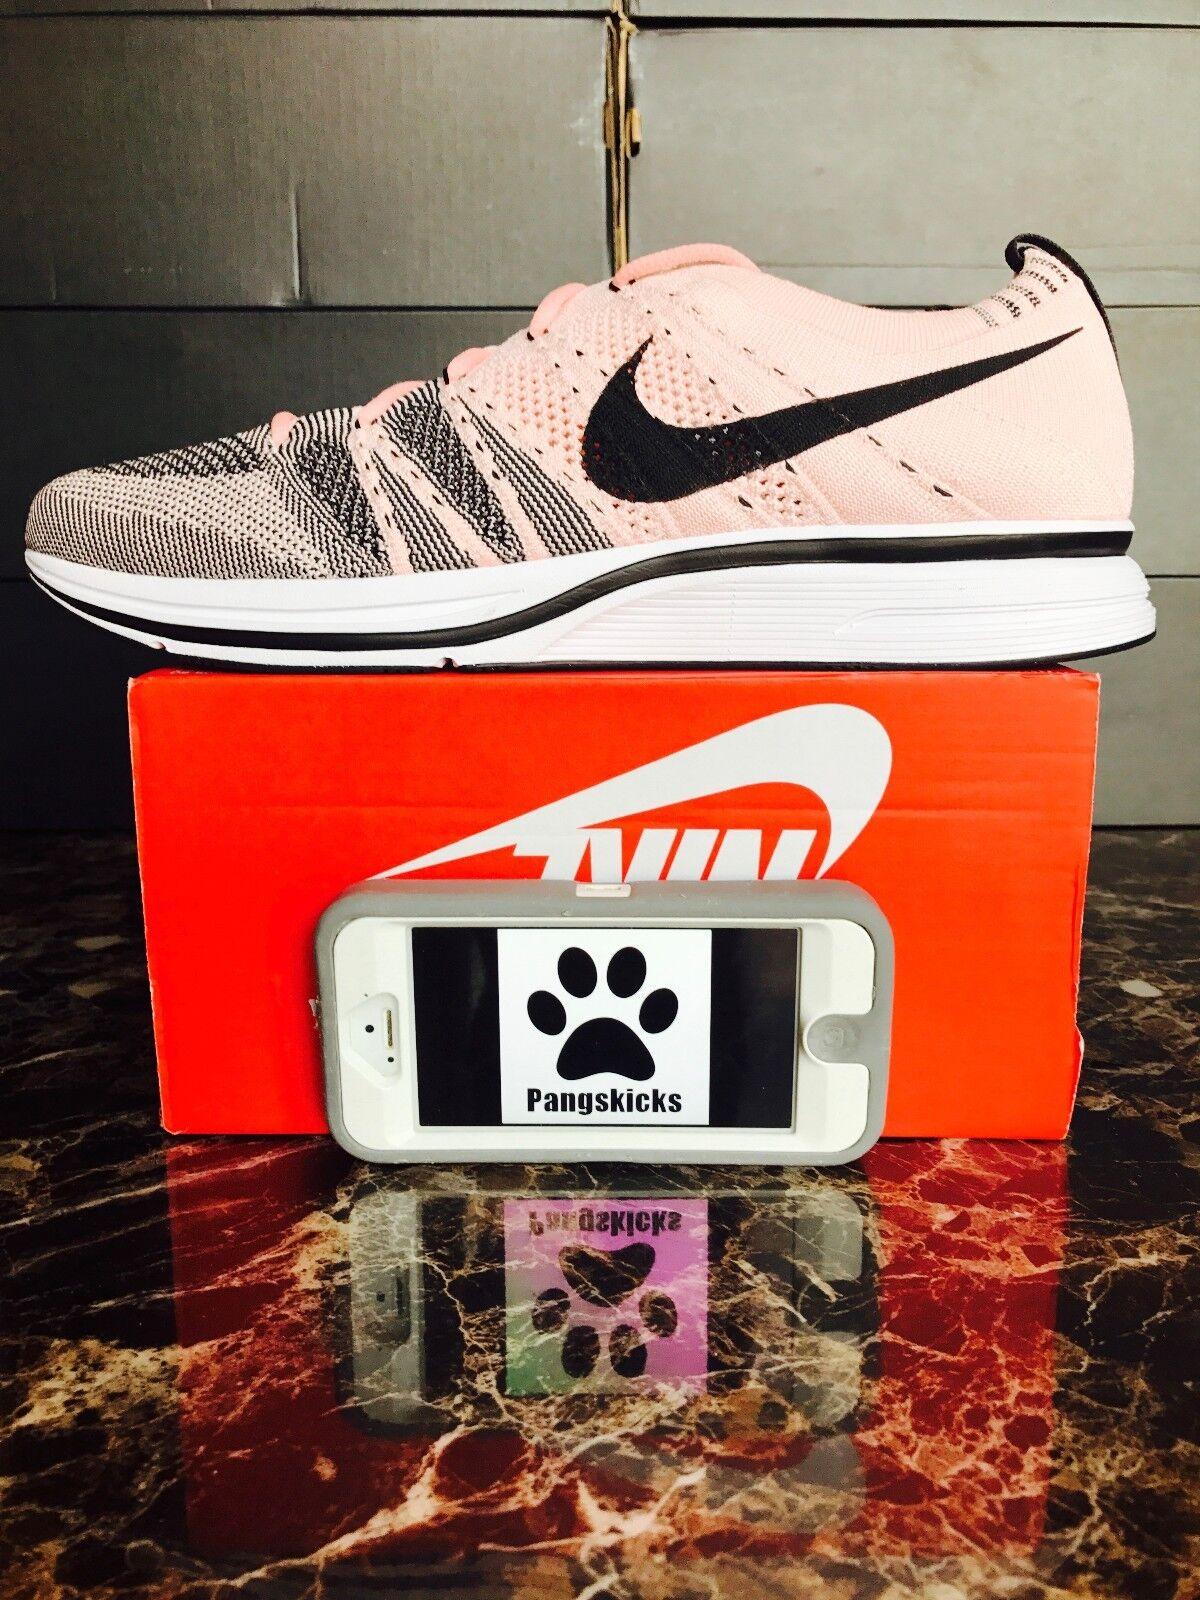 efce78396642 Купить Nike Flyknit Trainer Sunset Tint Black White AH8396-600 на ...